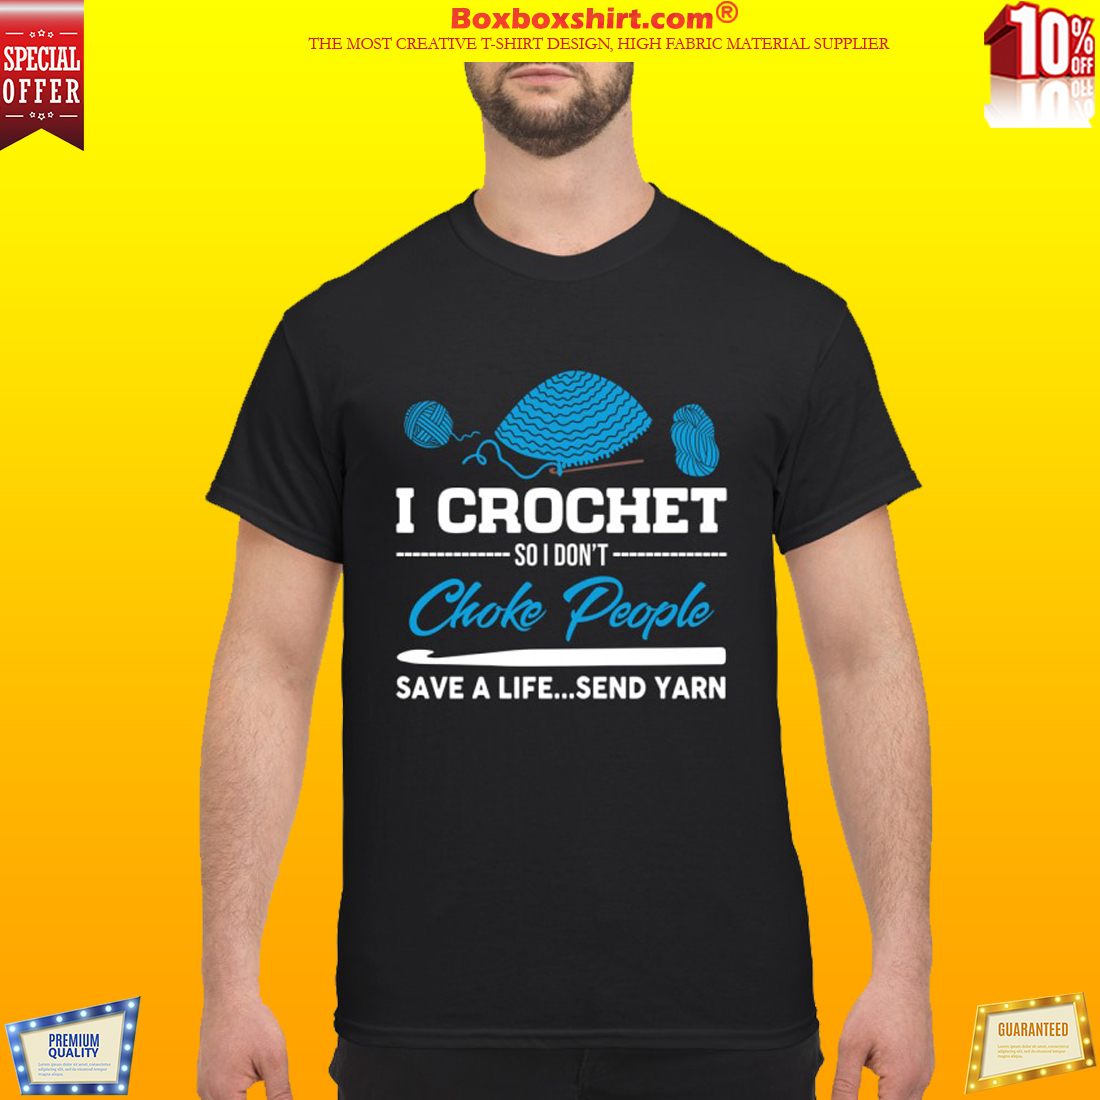 I crochet so I don't choke people save a life send yarn classic shirt